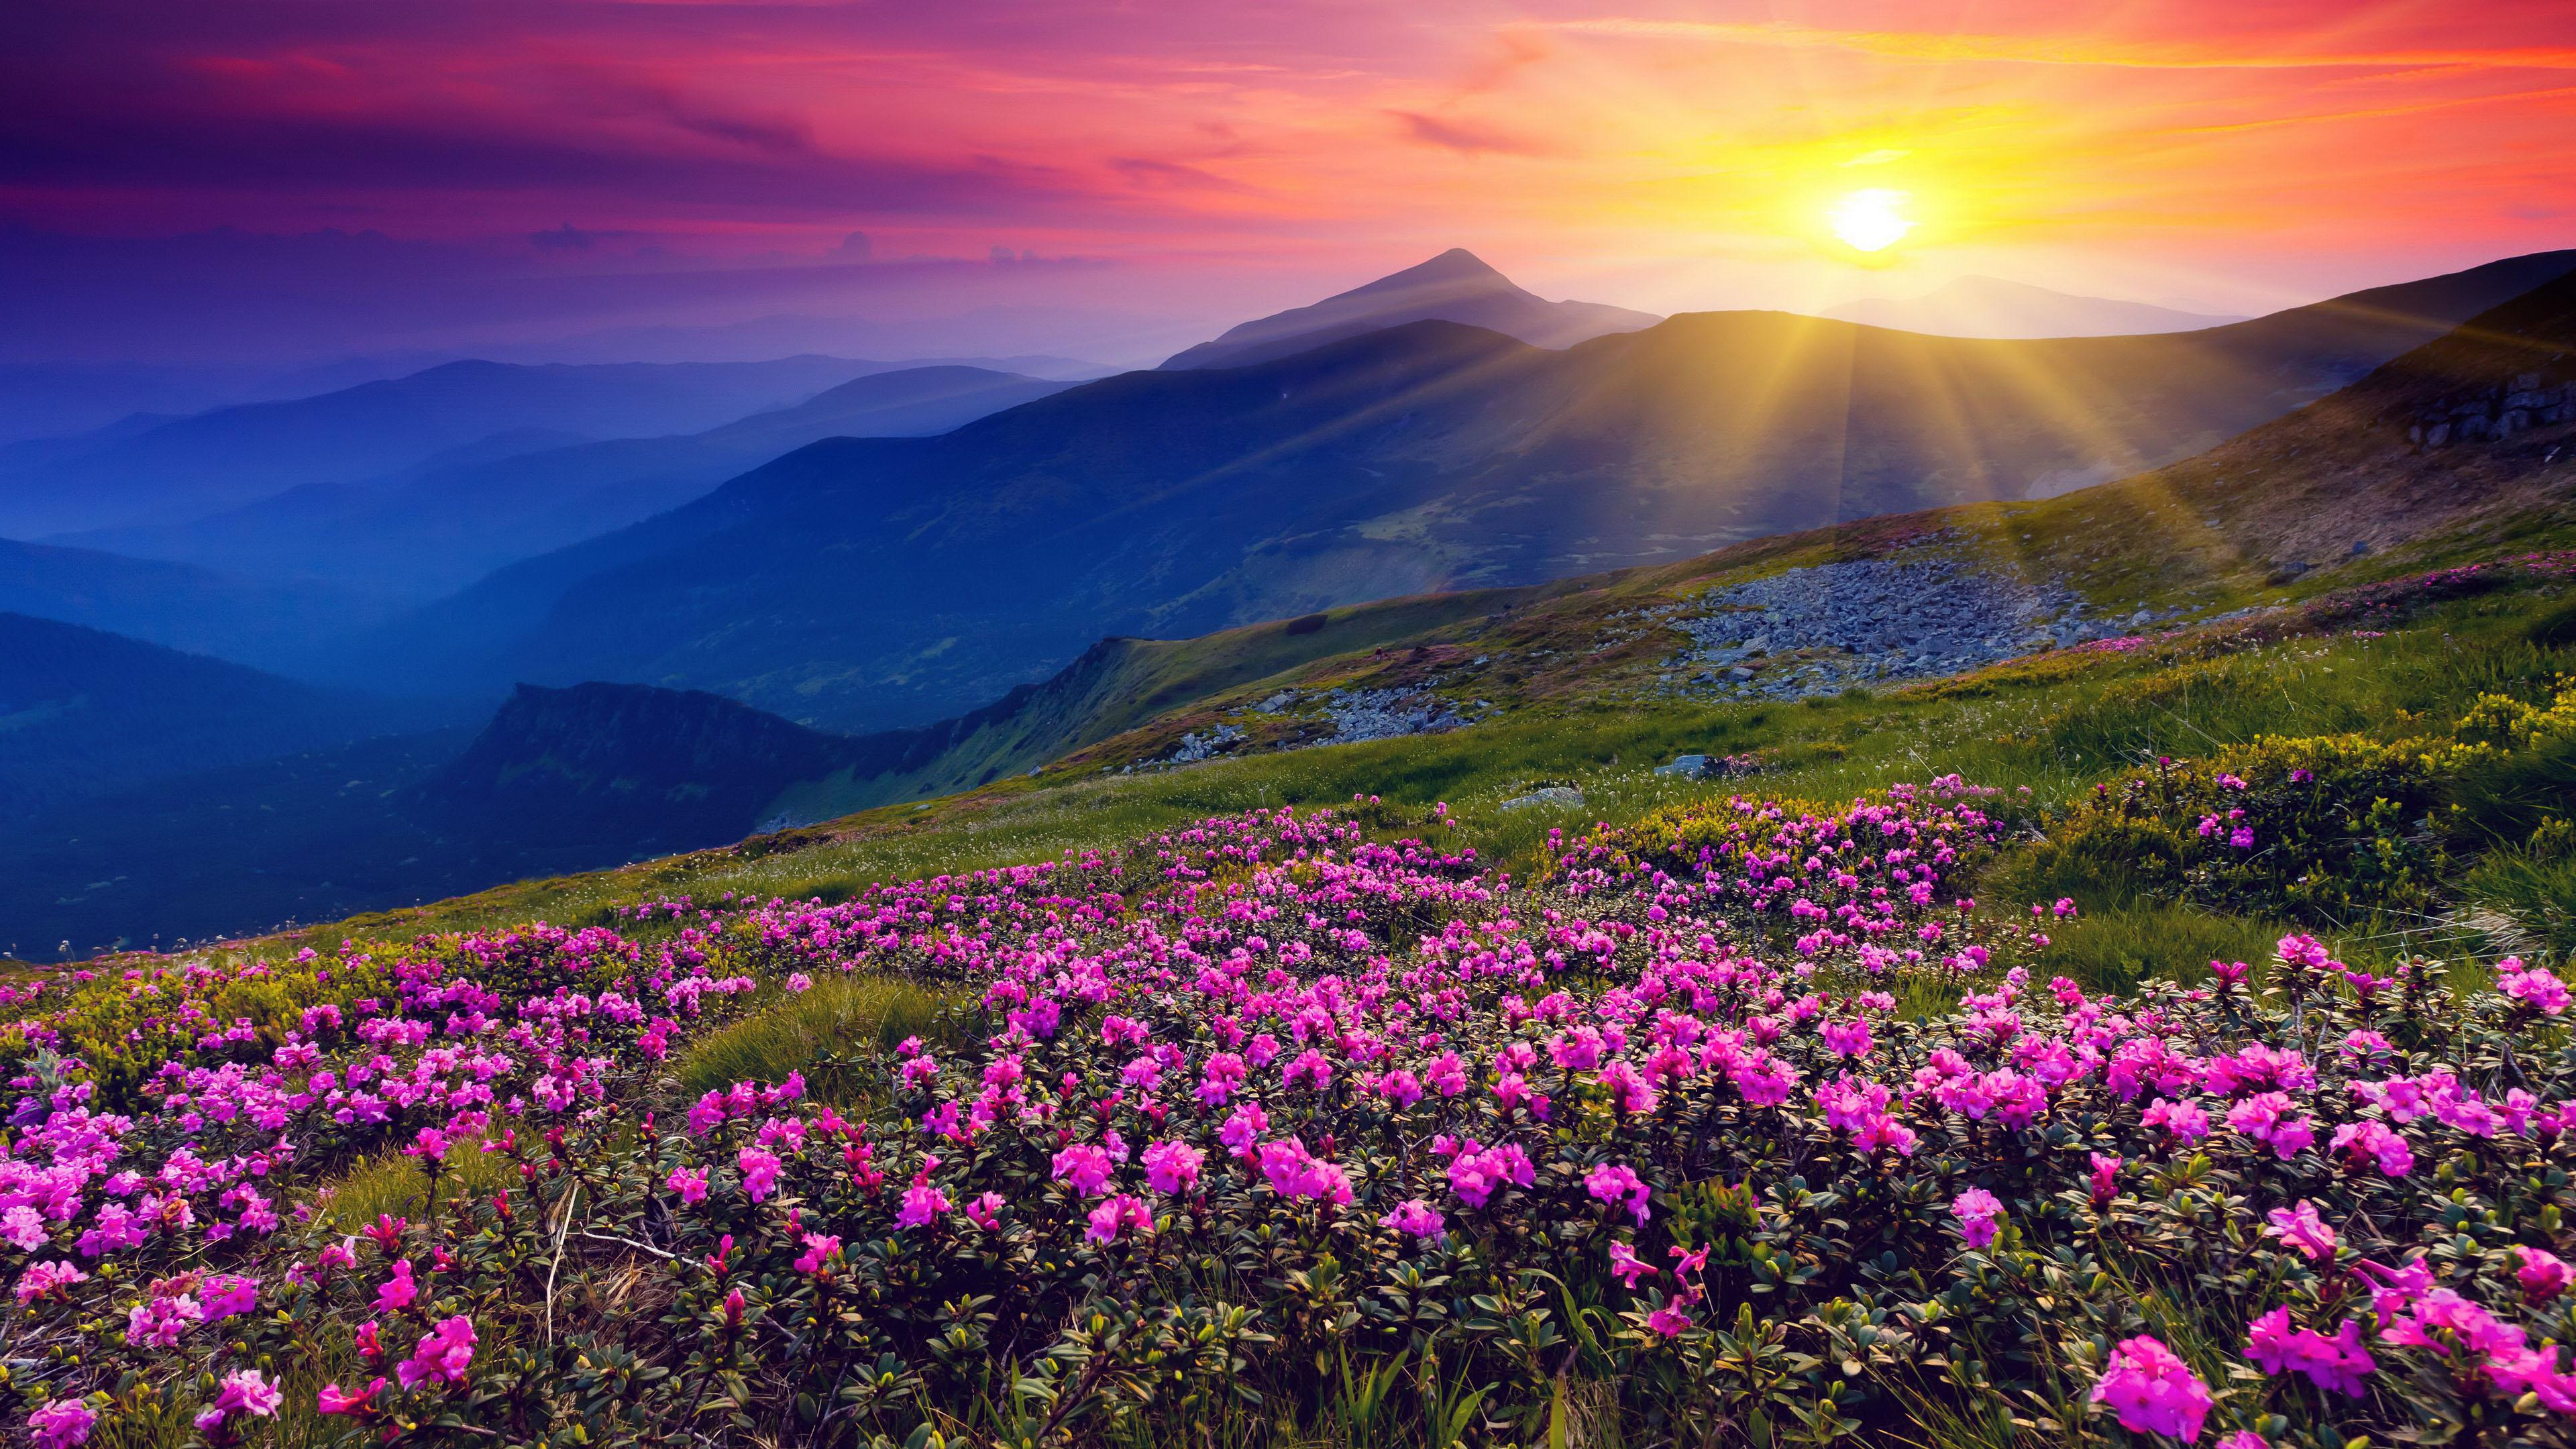 Flowers Hills Landscape Sunrise Wallpaper HD F 5602 Wallpaper 3840x2160